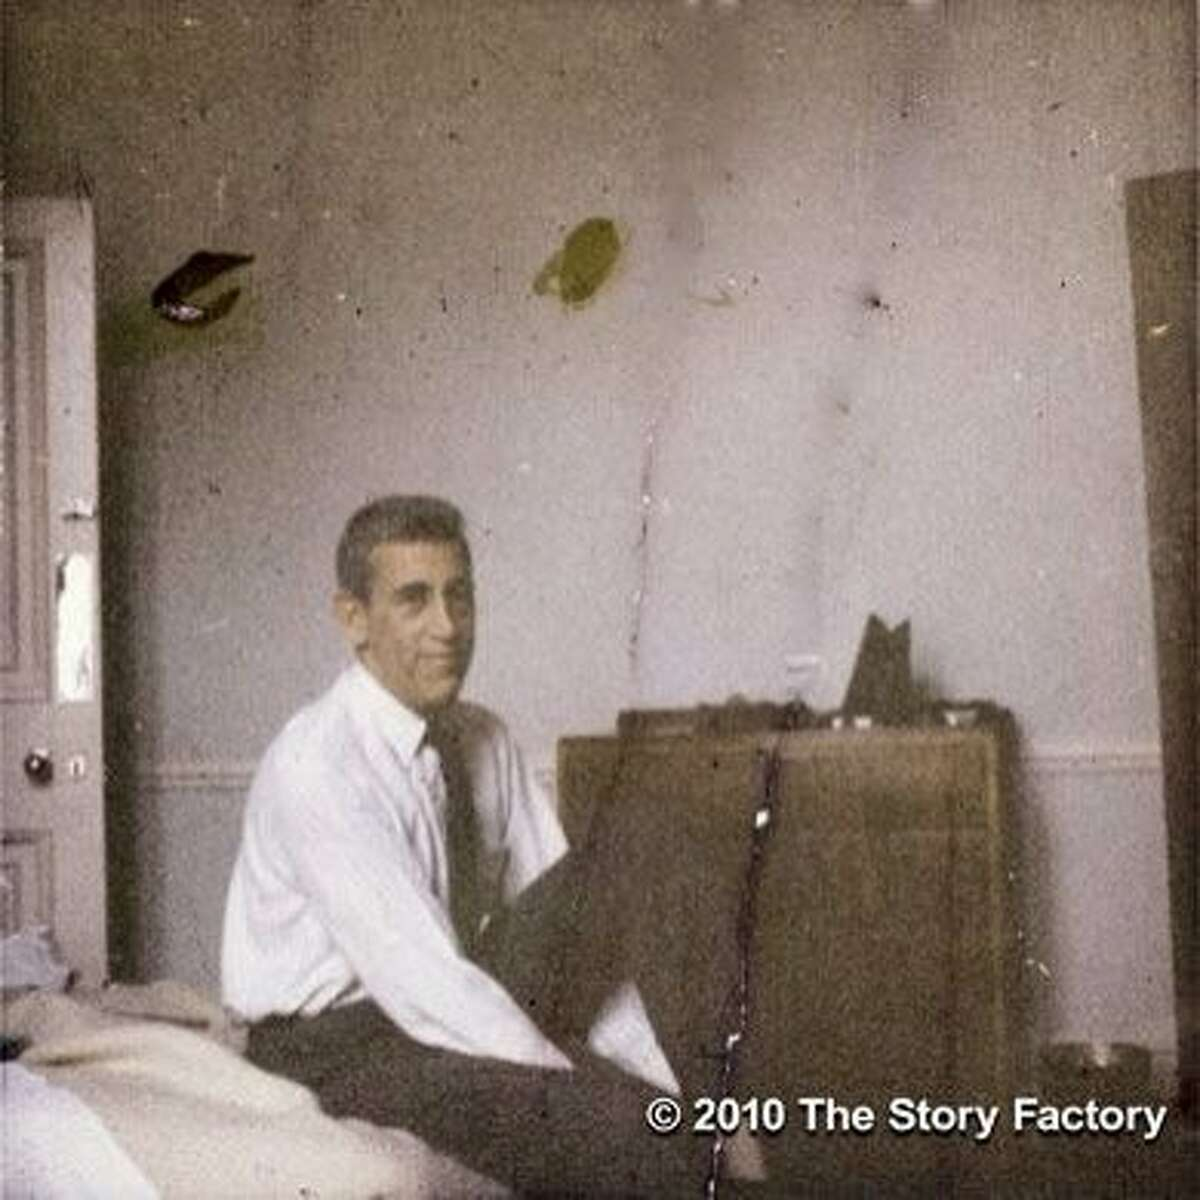 J.D. Salinger image from the documentary